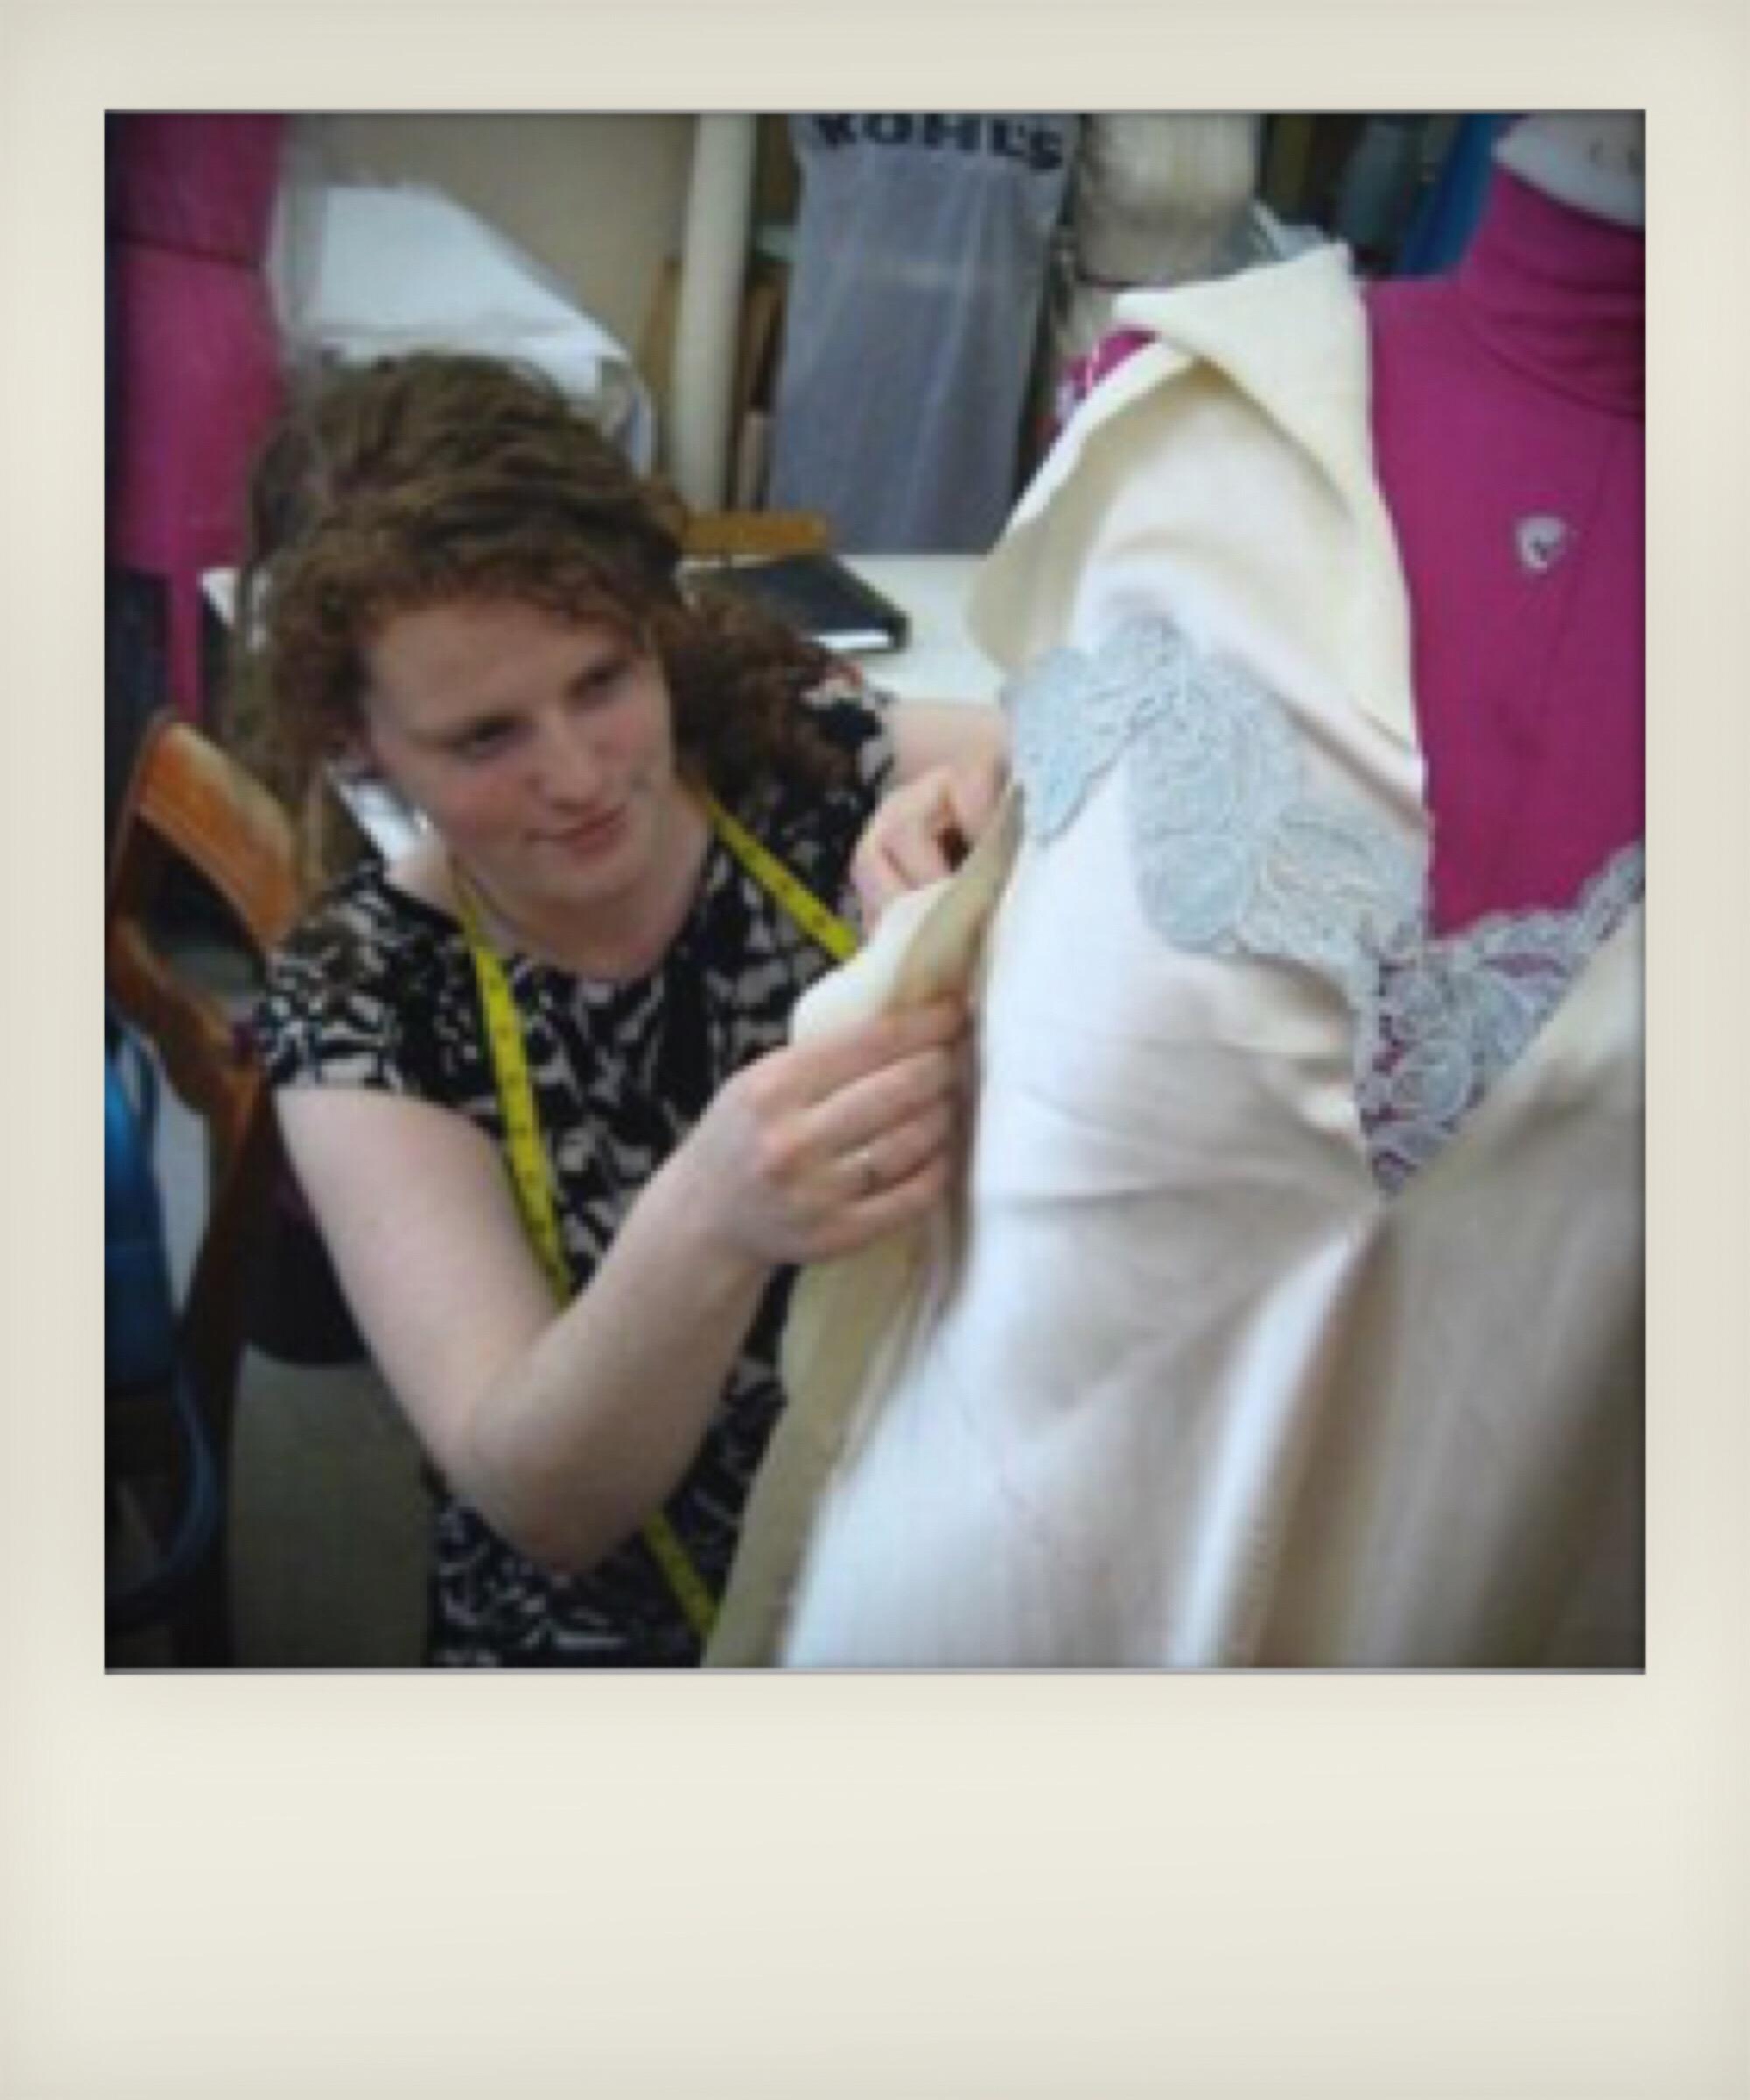 Hazel Corcoran, Costume Maker